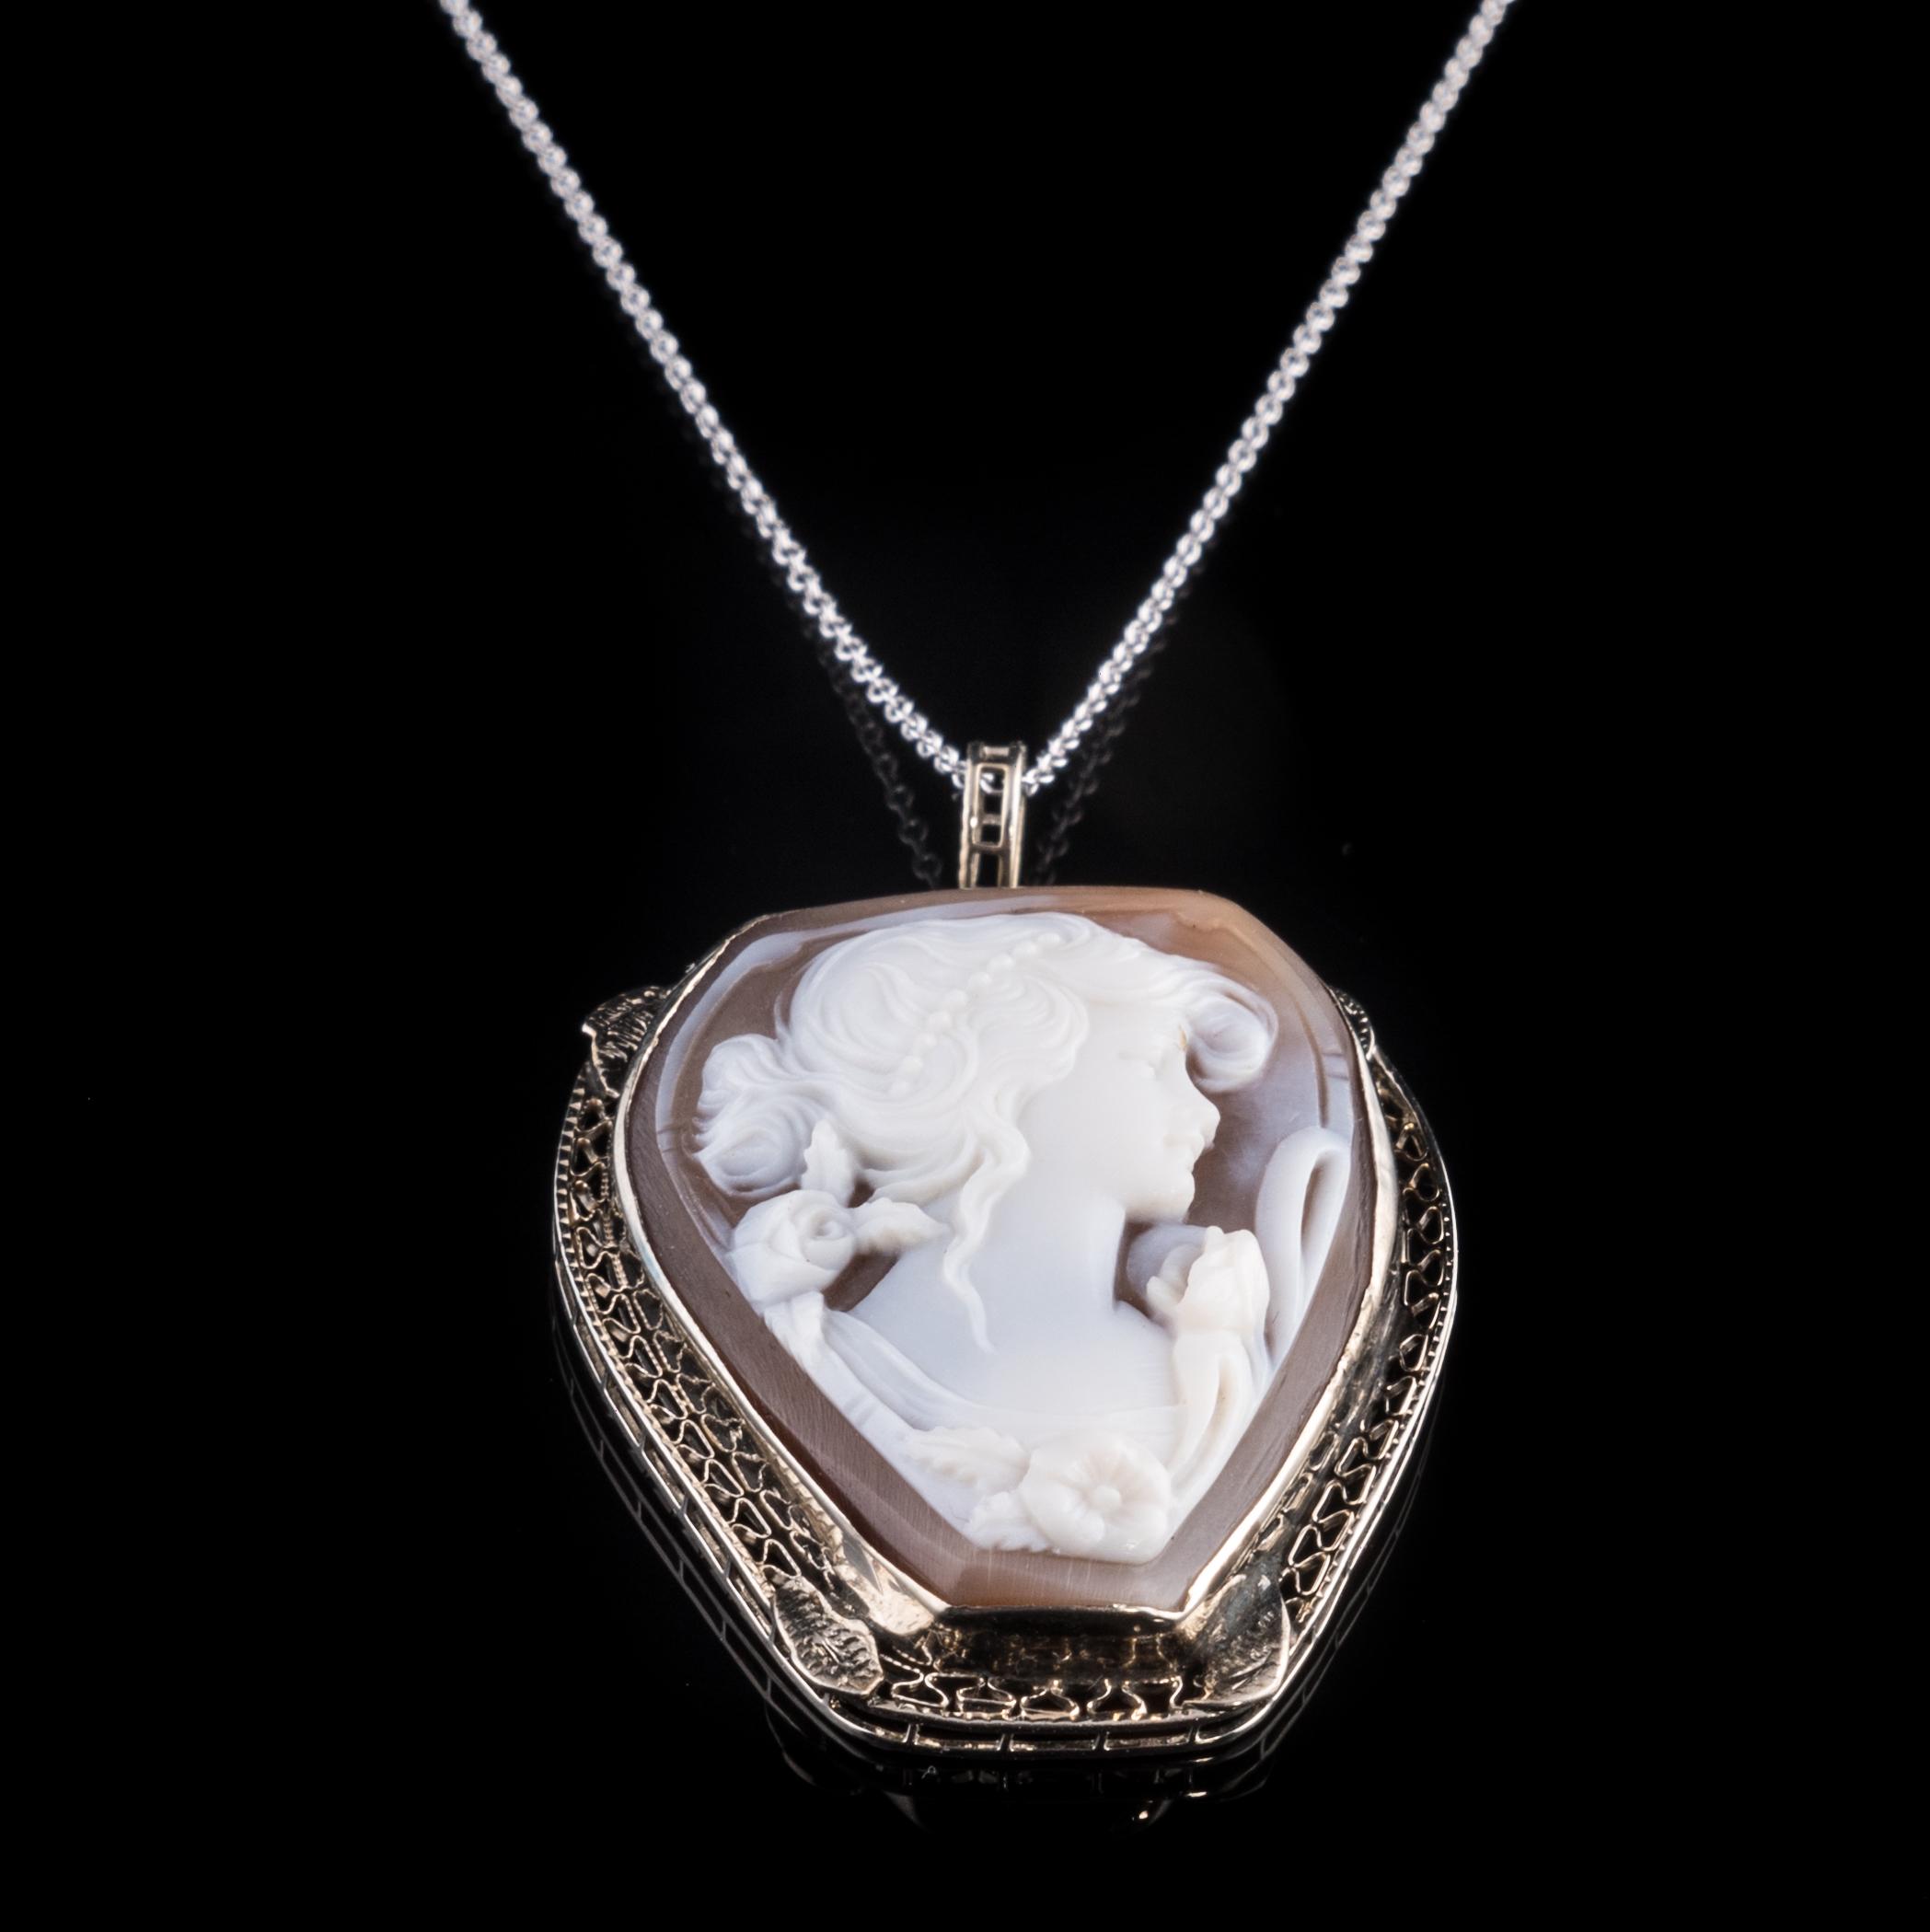 ESTATE 14K white gold shell cameo necklace with filigree circa 1920s